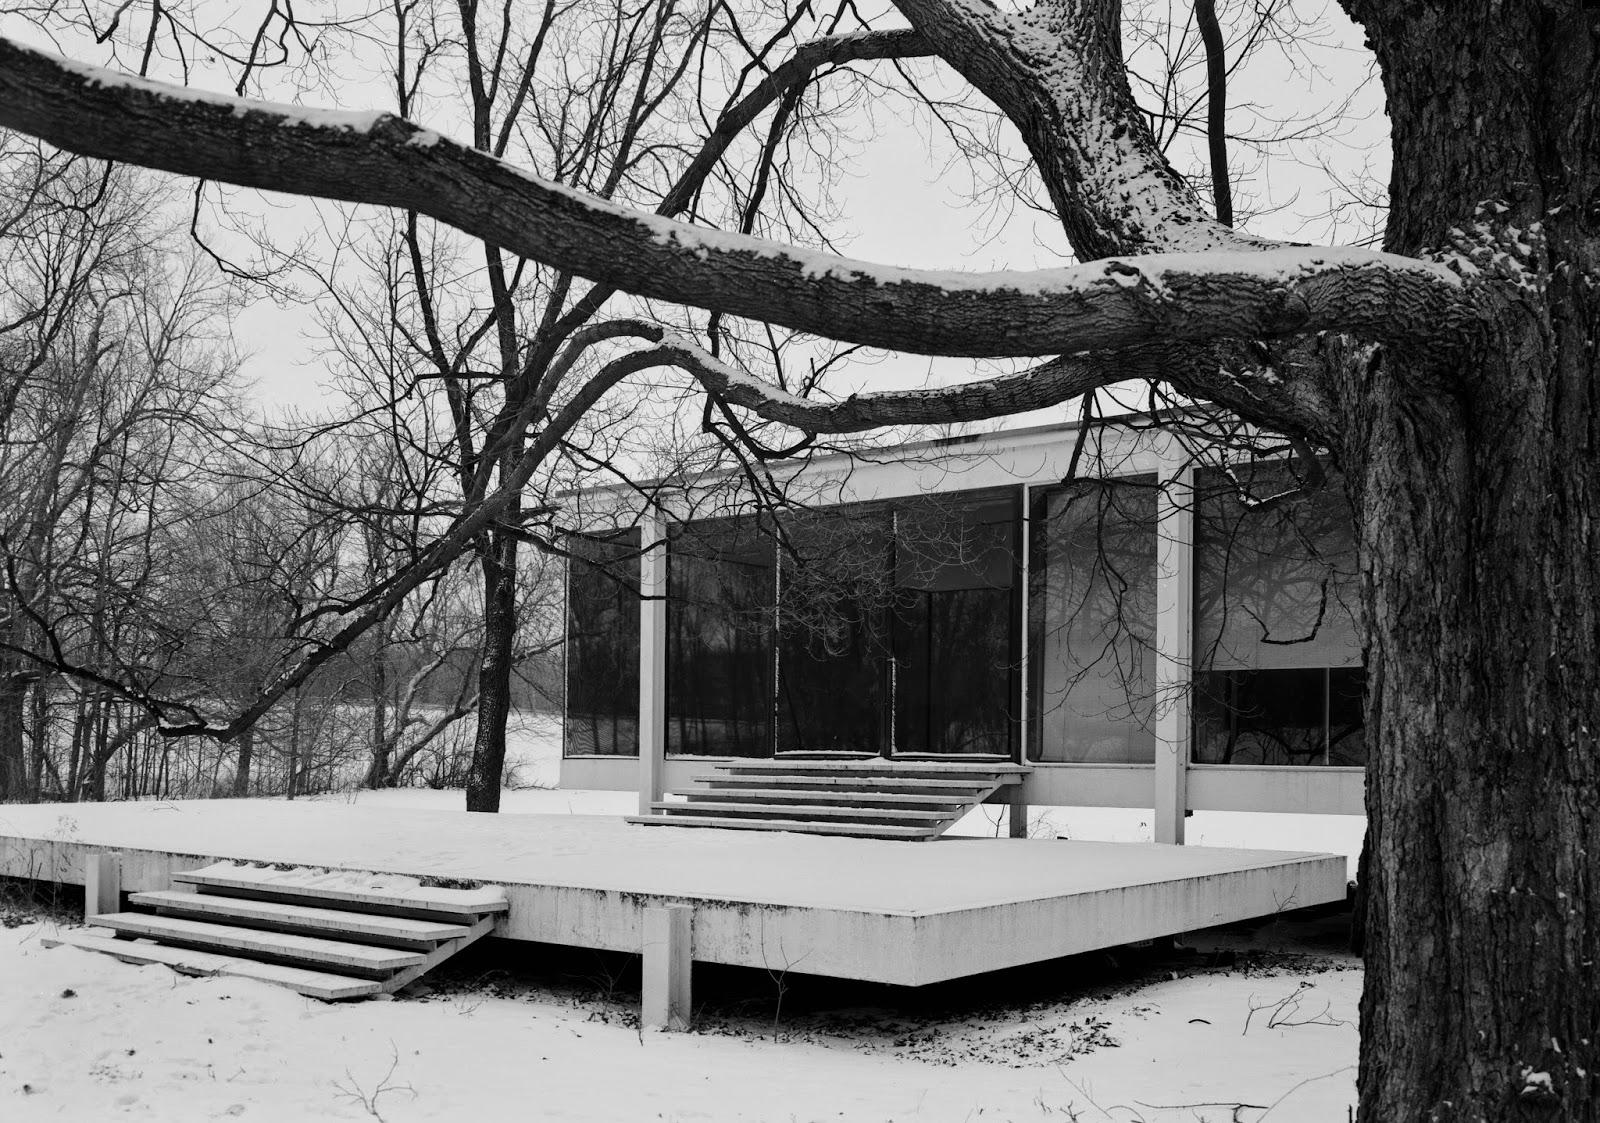 blog de phaco farnsworth house le minimalisme. Black Bedroom Furniture Sets. Home Design Ideas